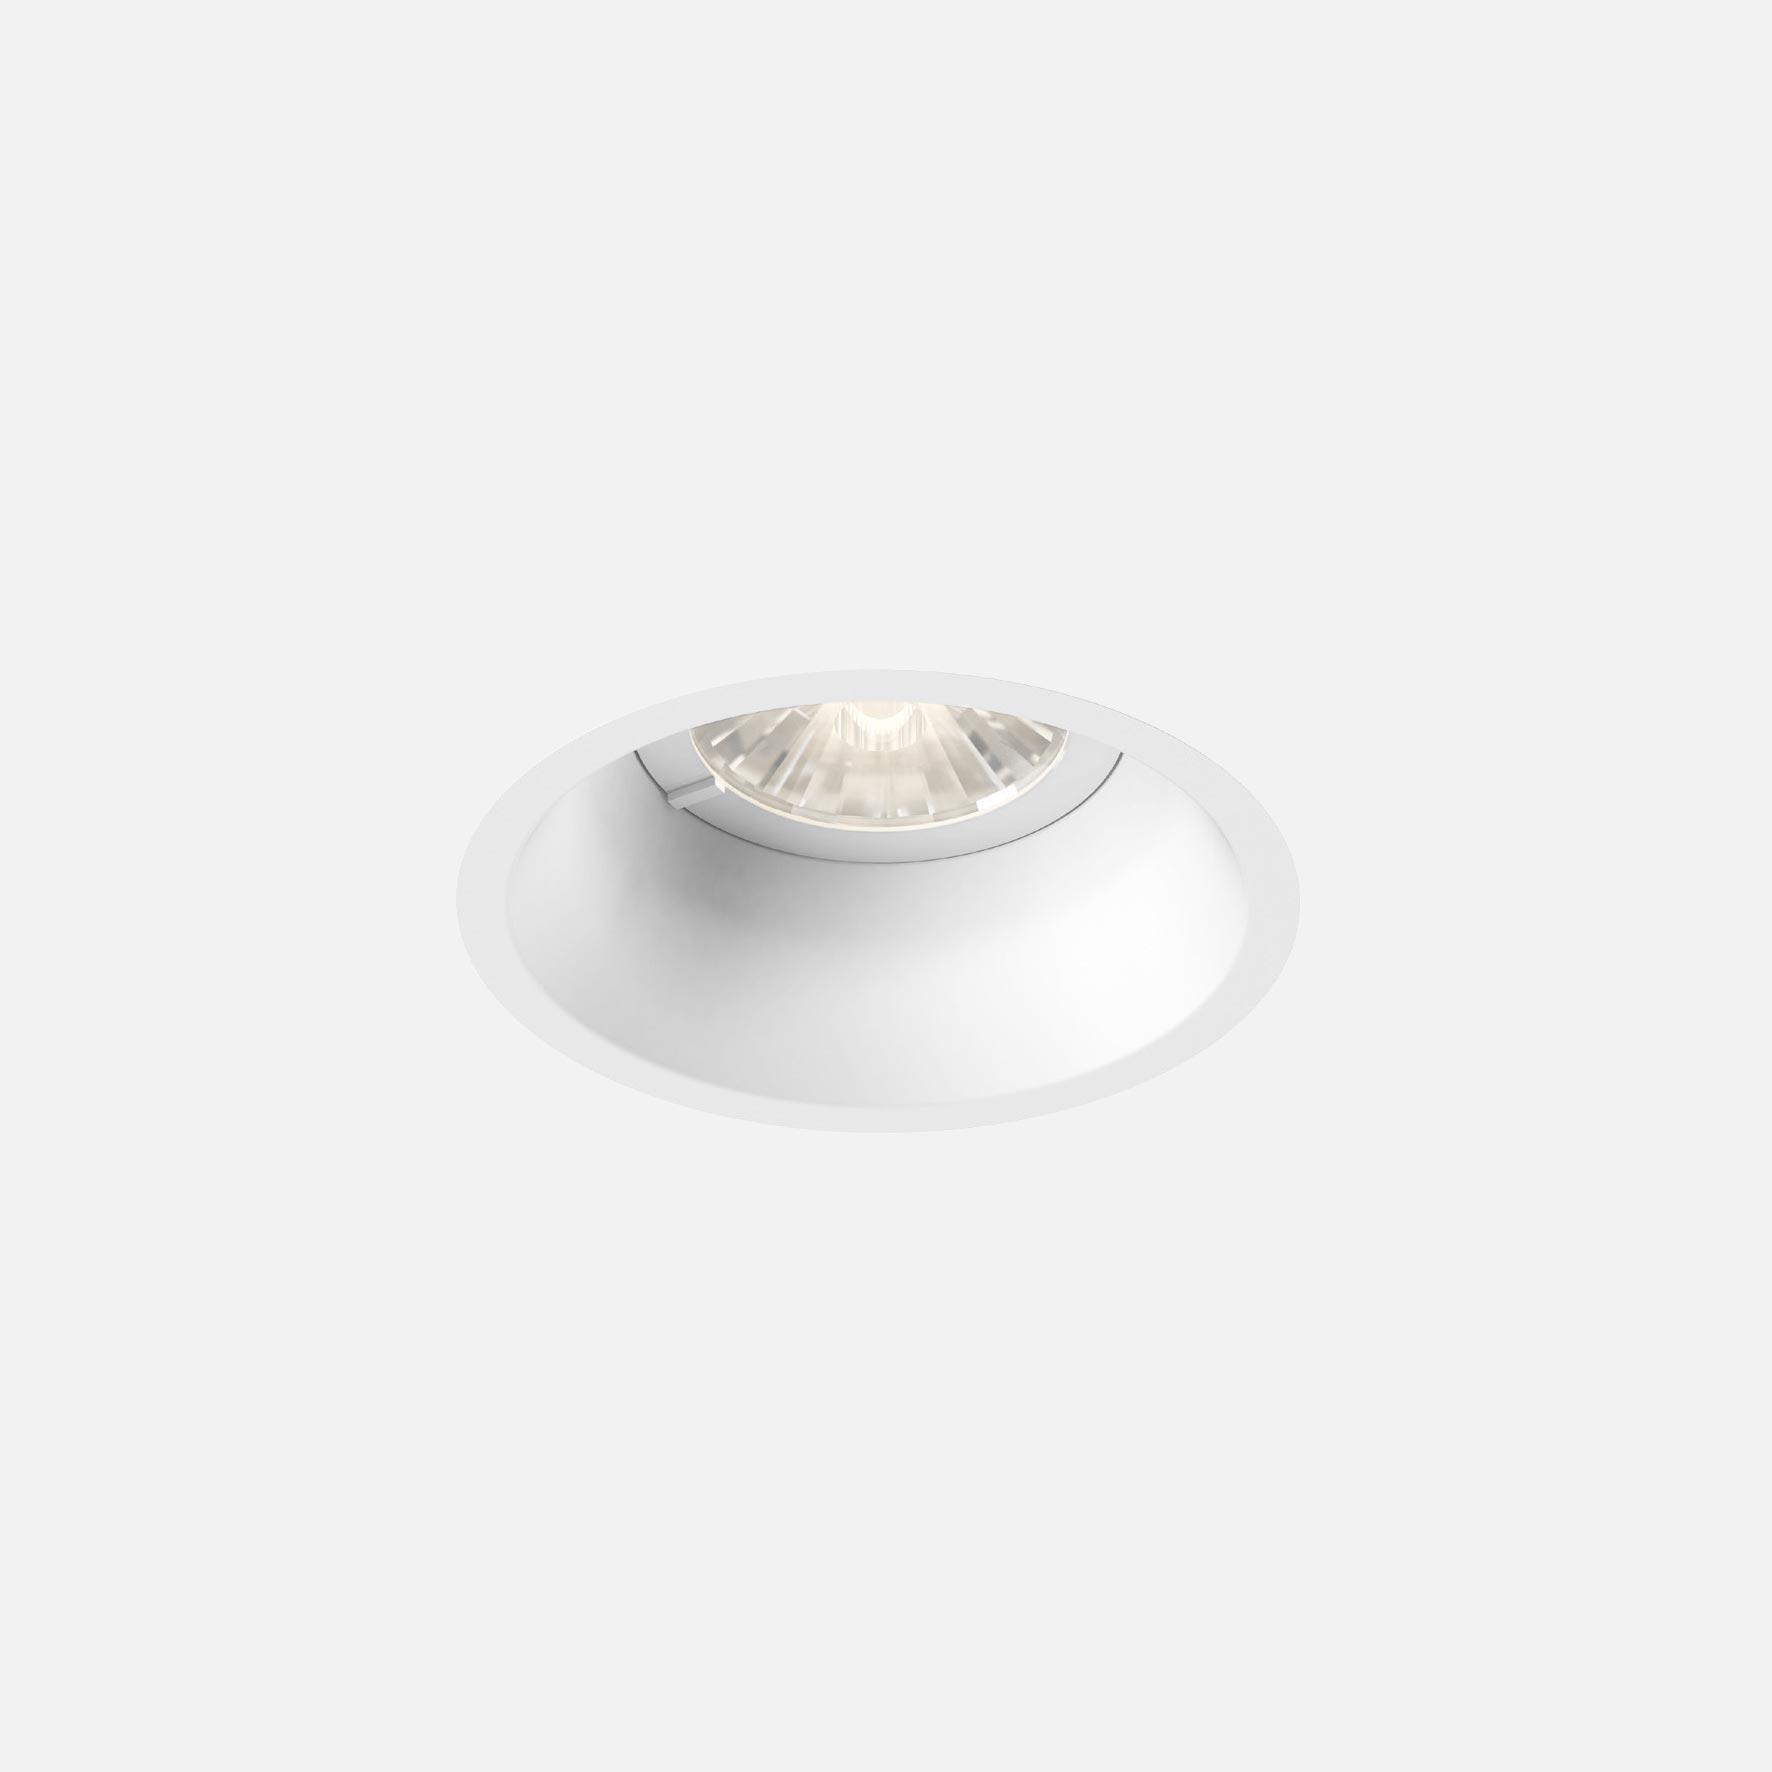 Deep 1.0 led white texture 2700k